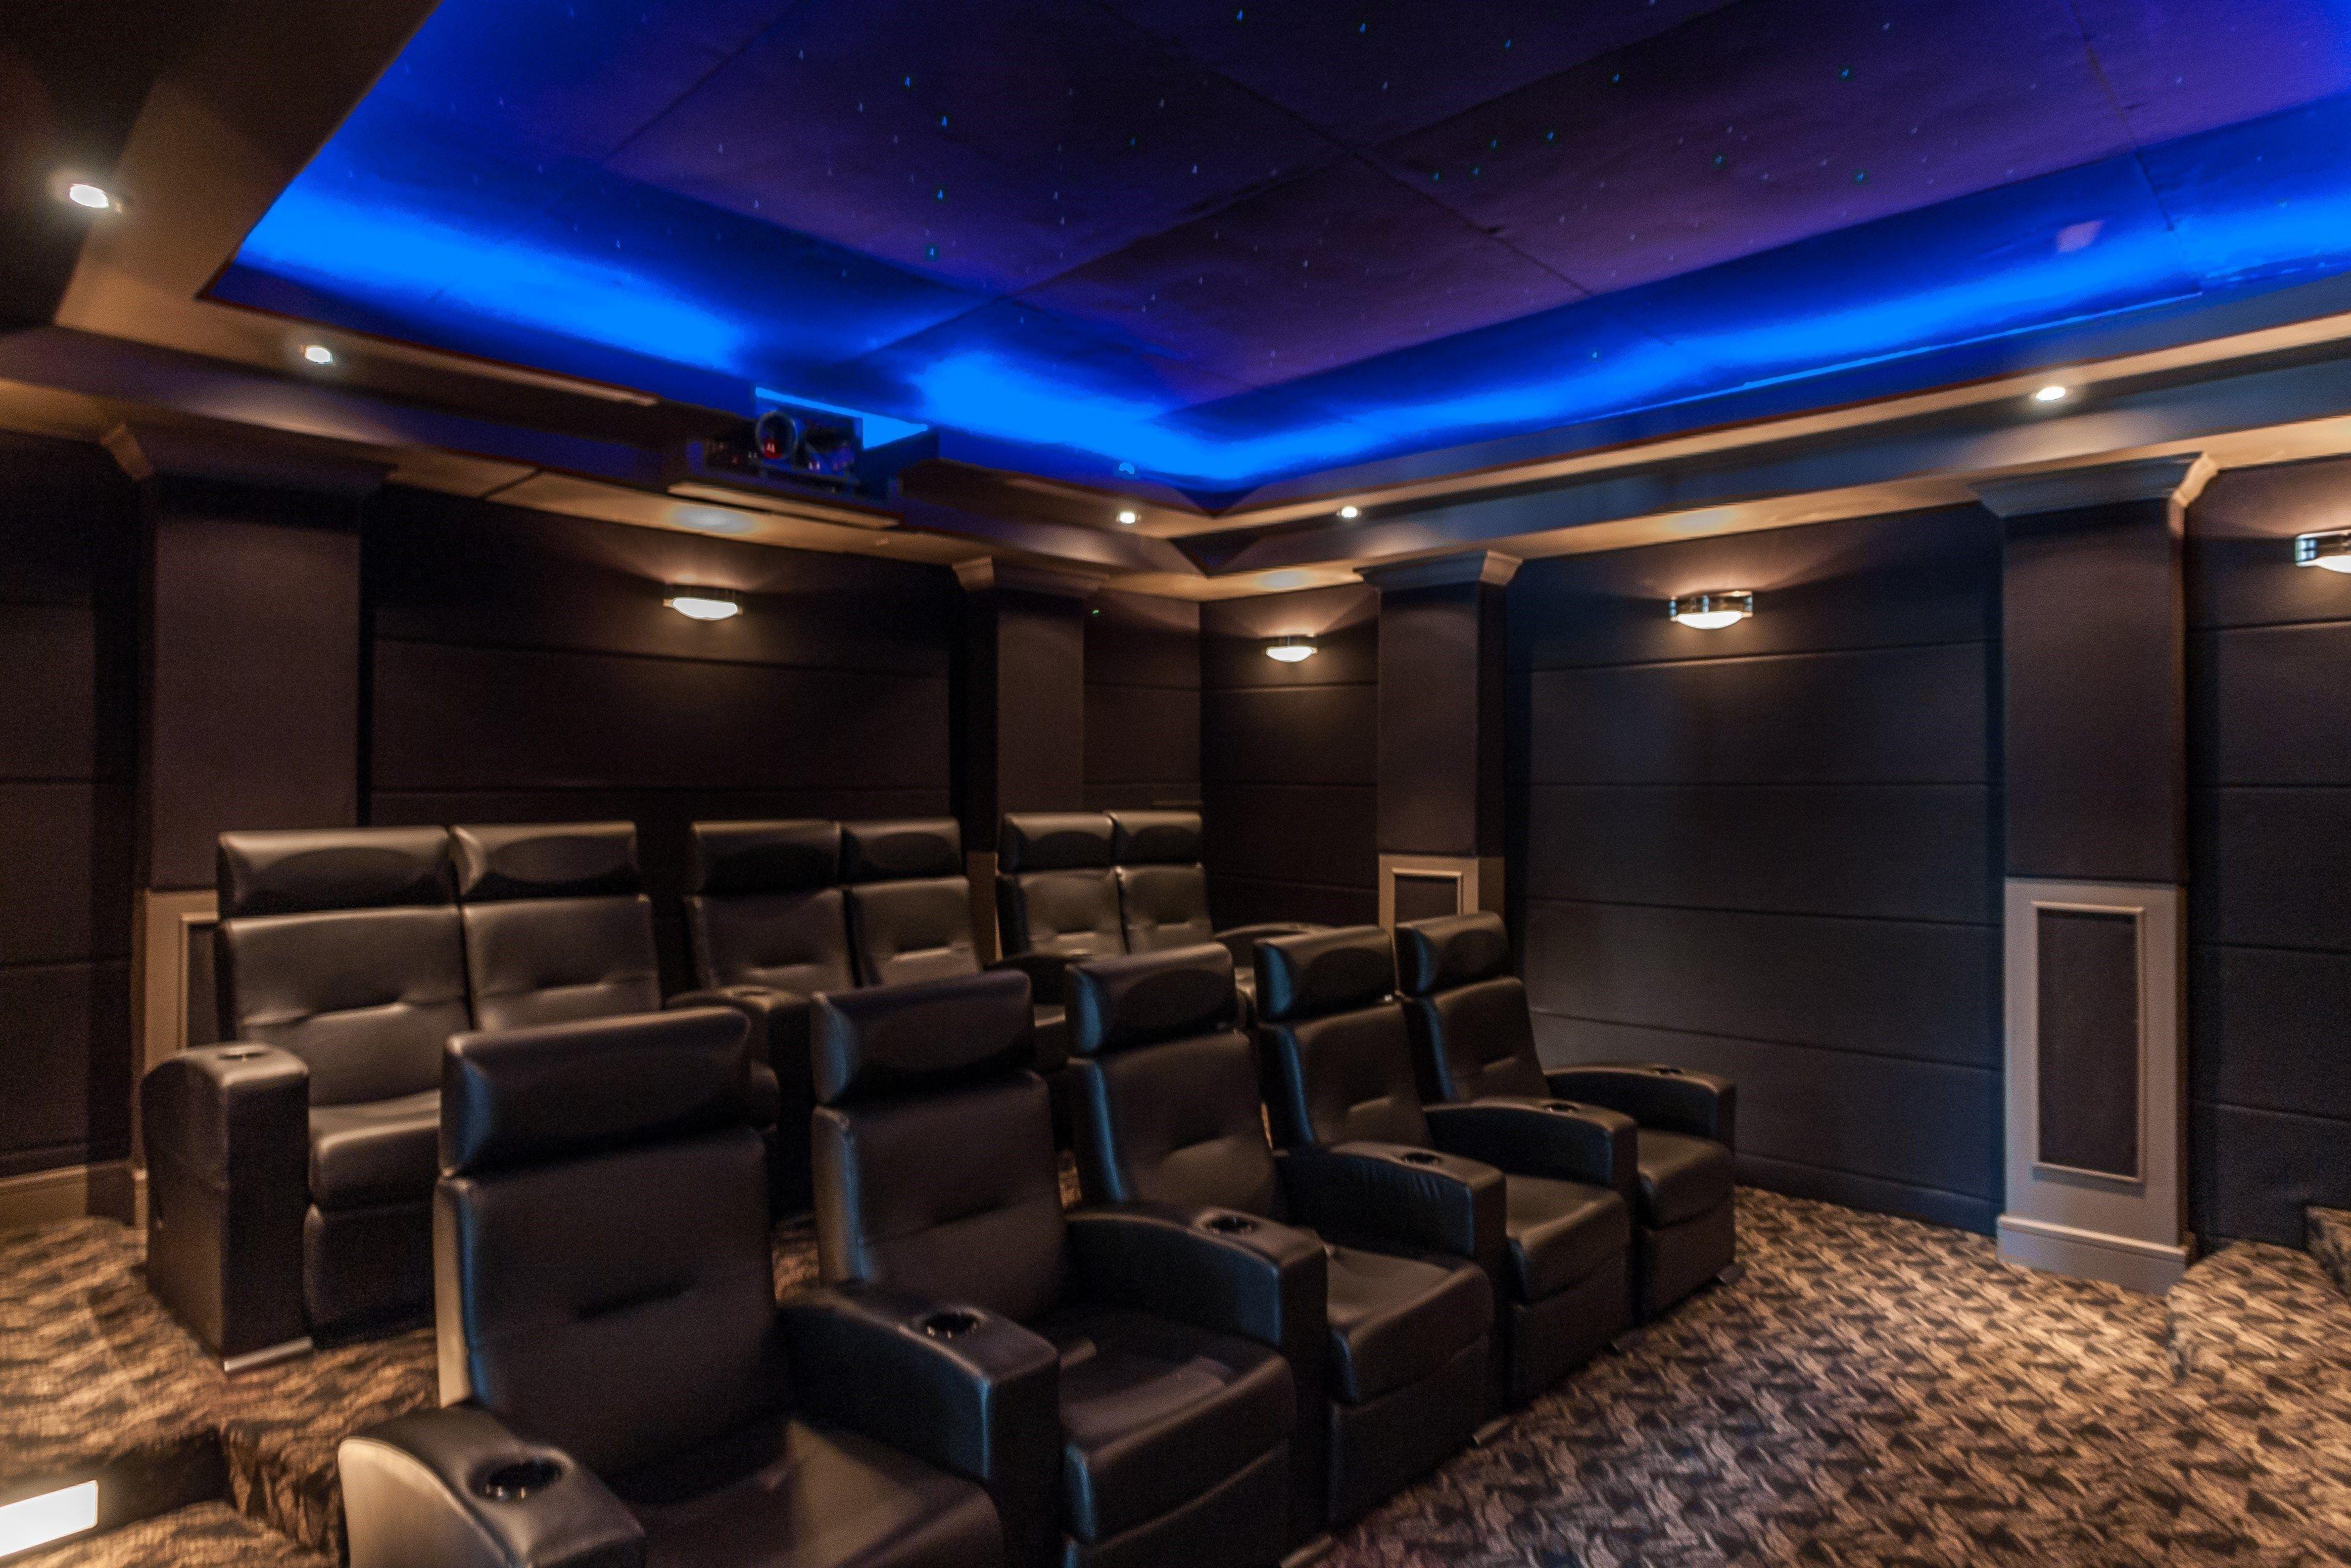 raleigh durham movie theaters